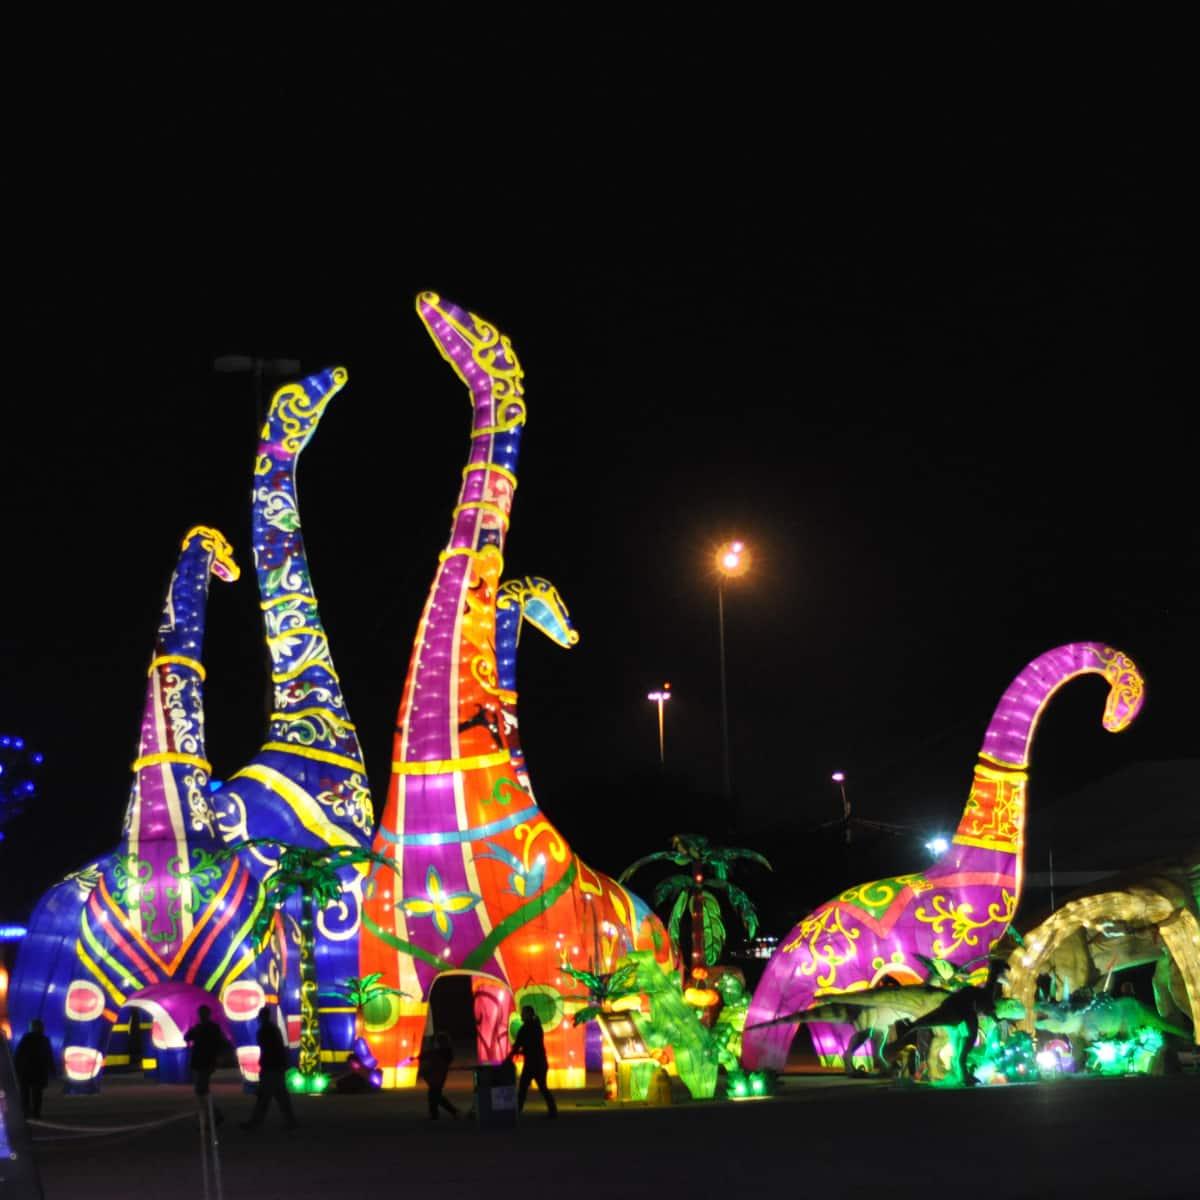 Dinosaurs at Magical Winter Lights